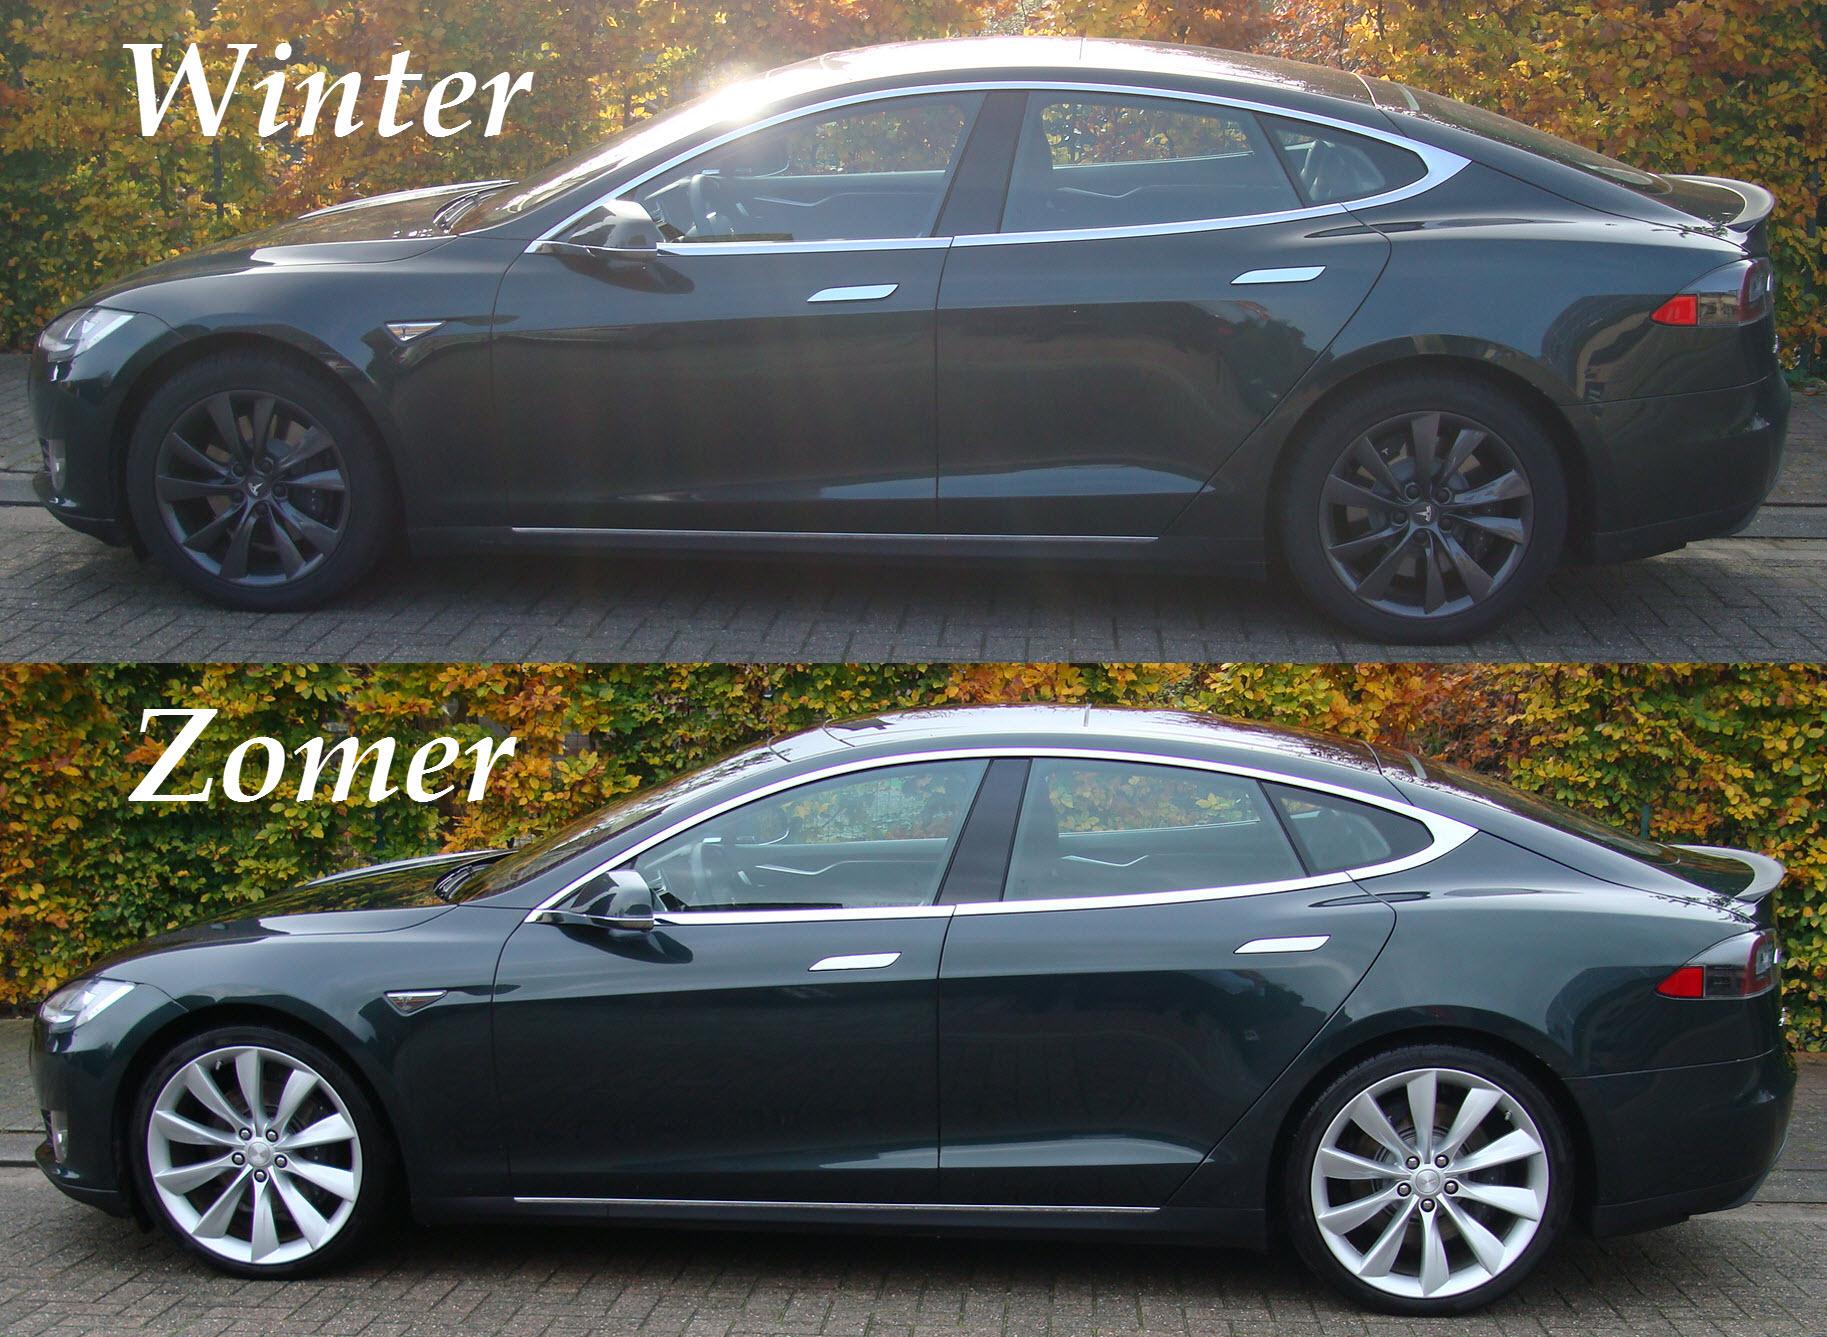 Winter versus zomer.jpg